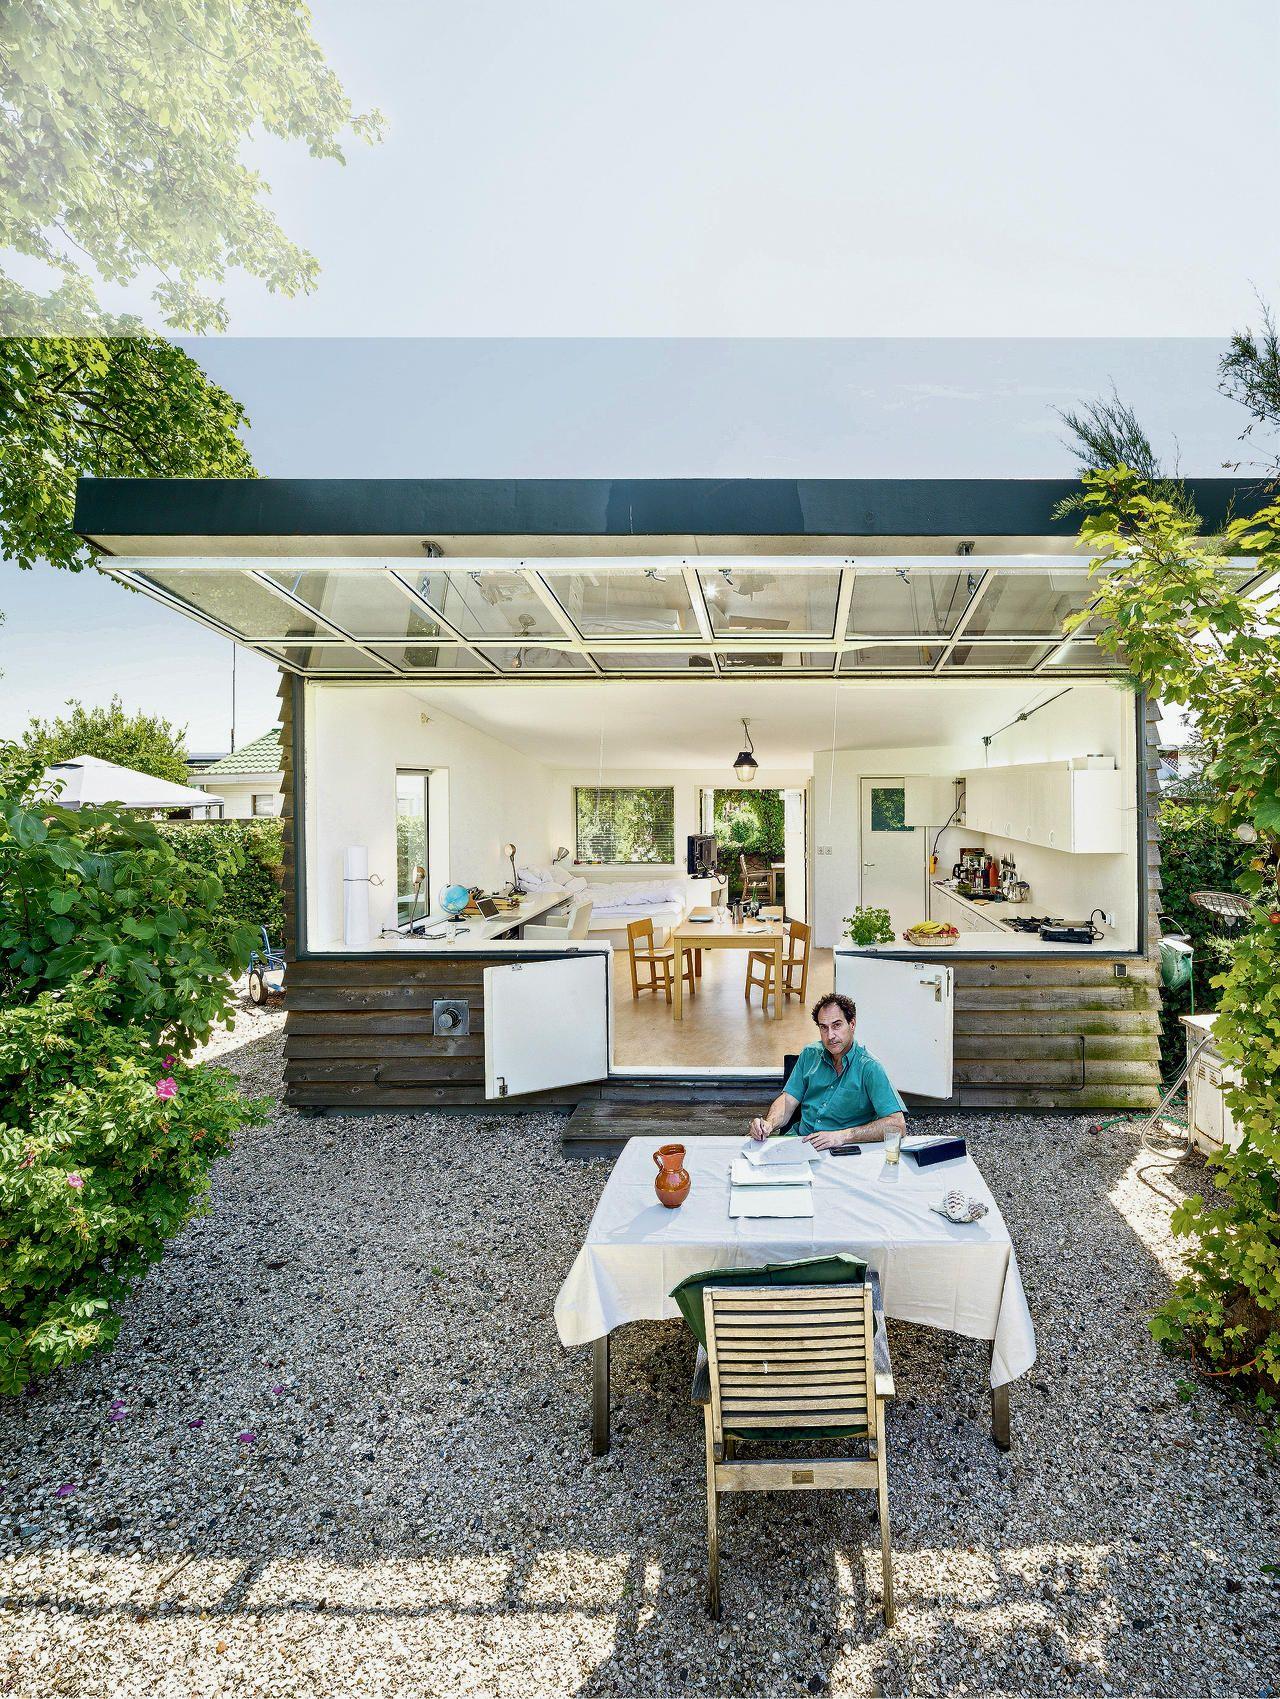 Joep Van Lieshout - Tuinhuisje Hut Tuinhuisjes